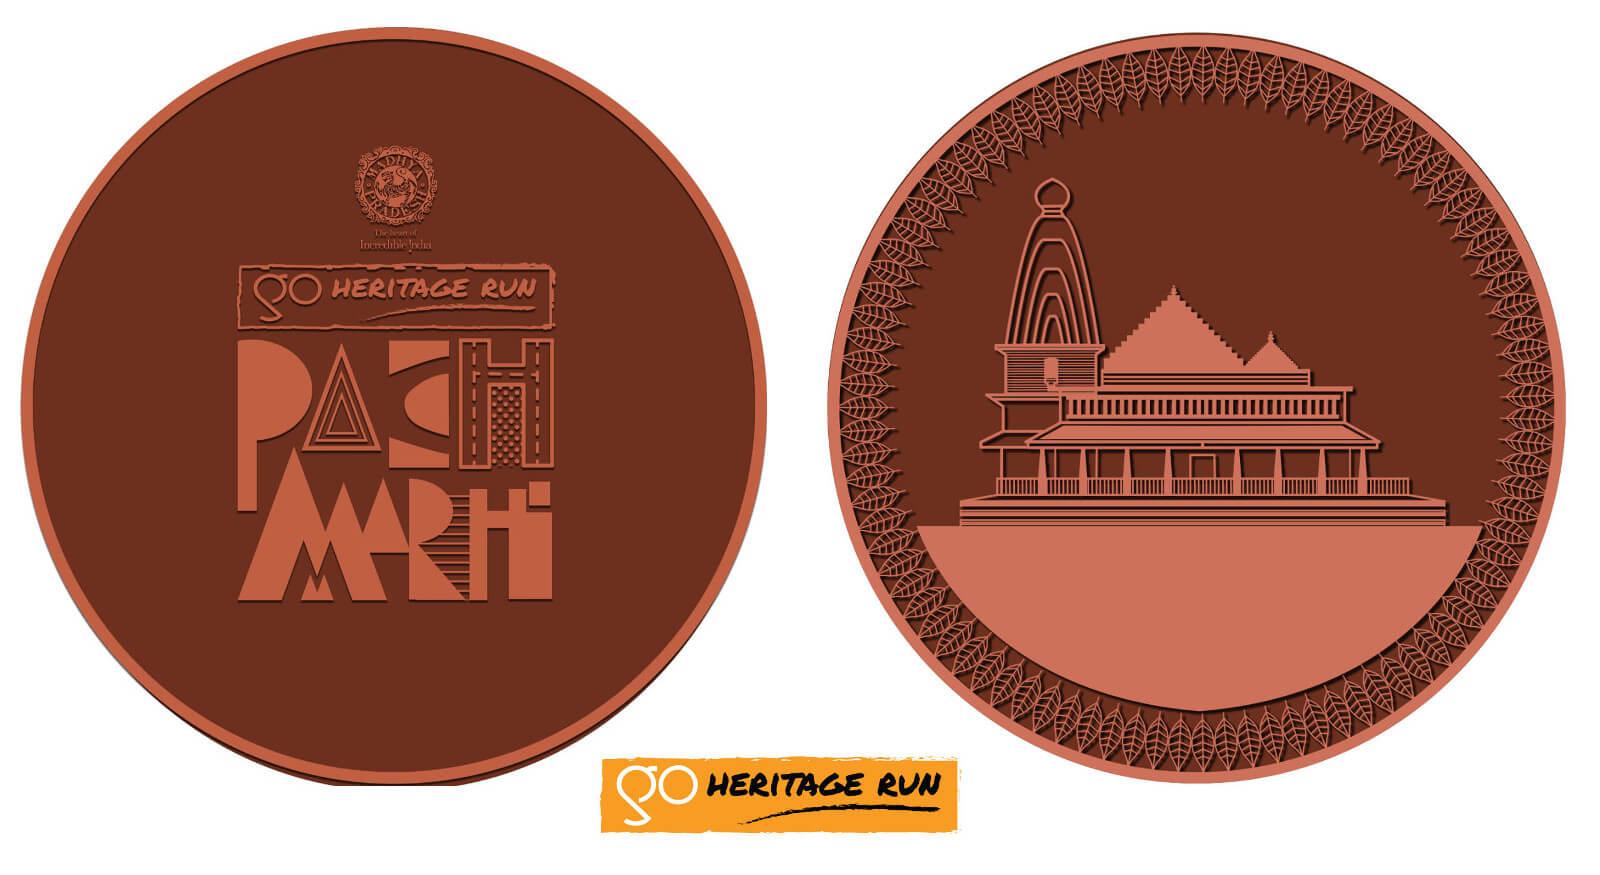 Go Heritage Run Pachmarhi 2020 medal